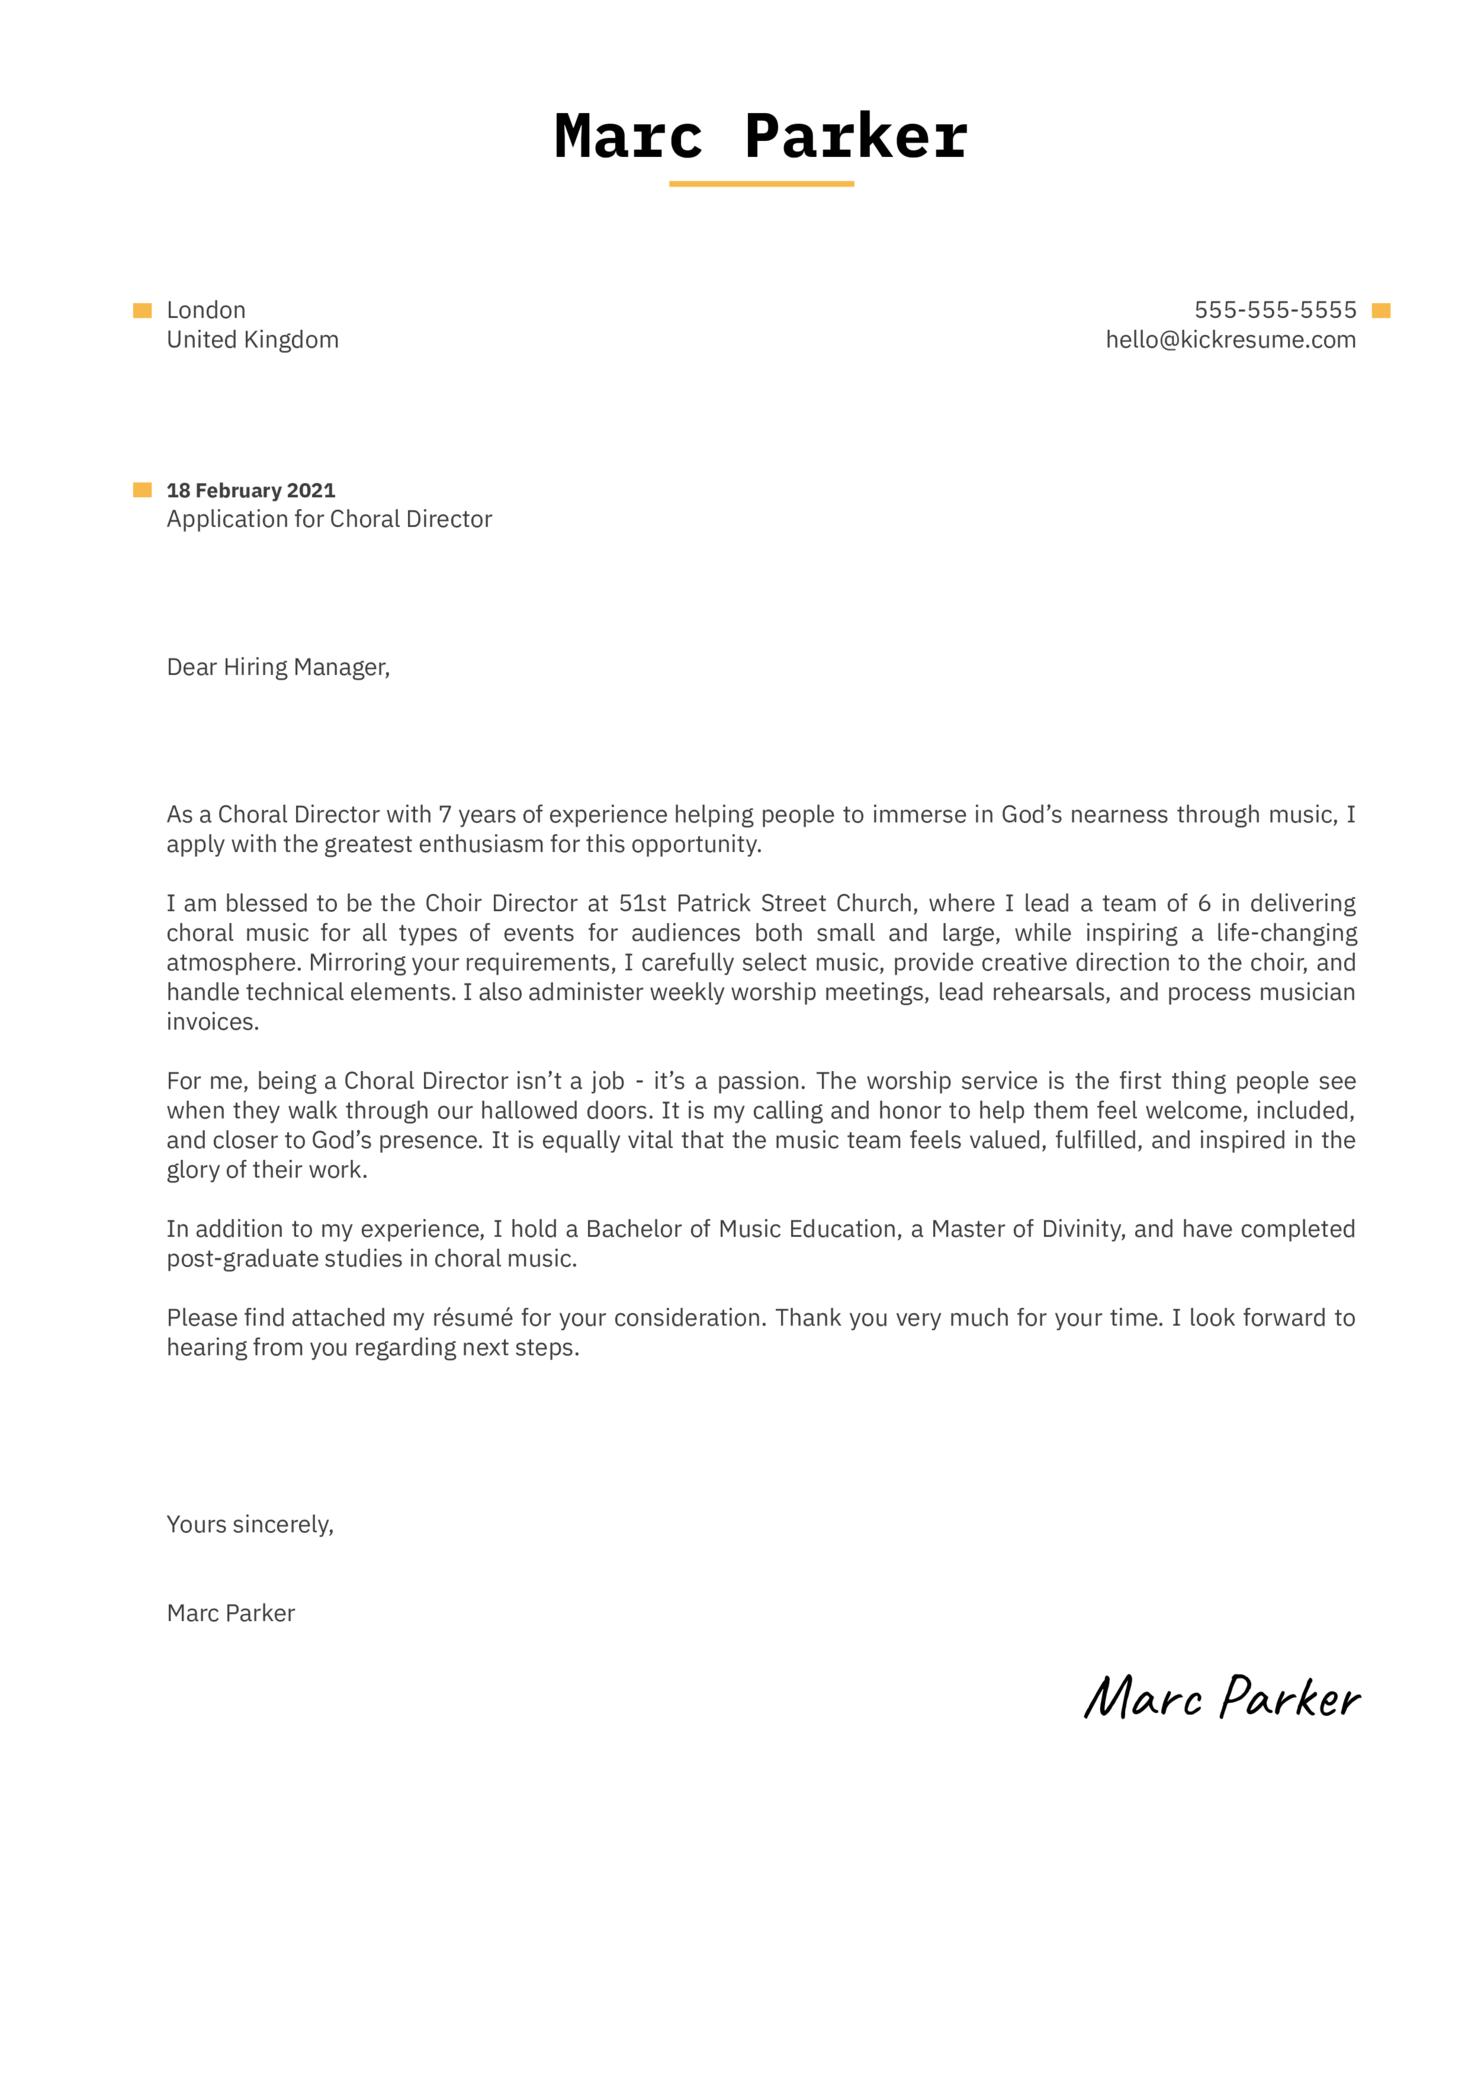 Choral Director Cover Letter Sample